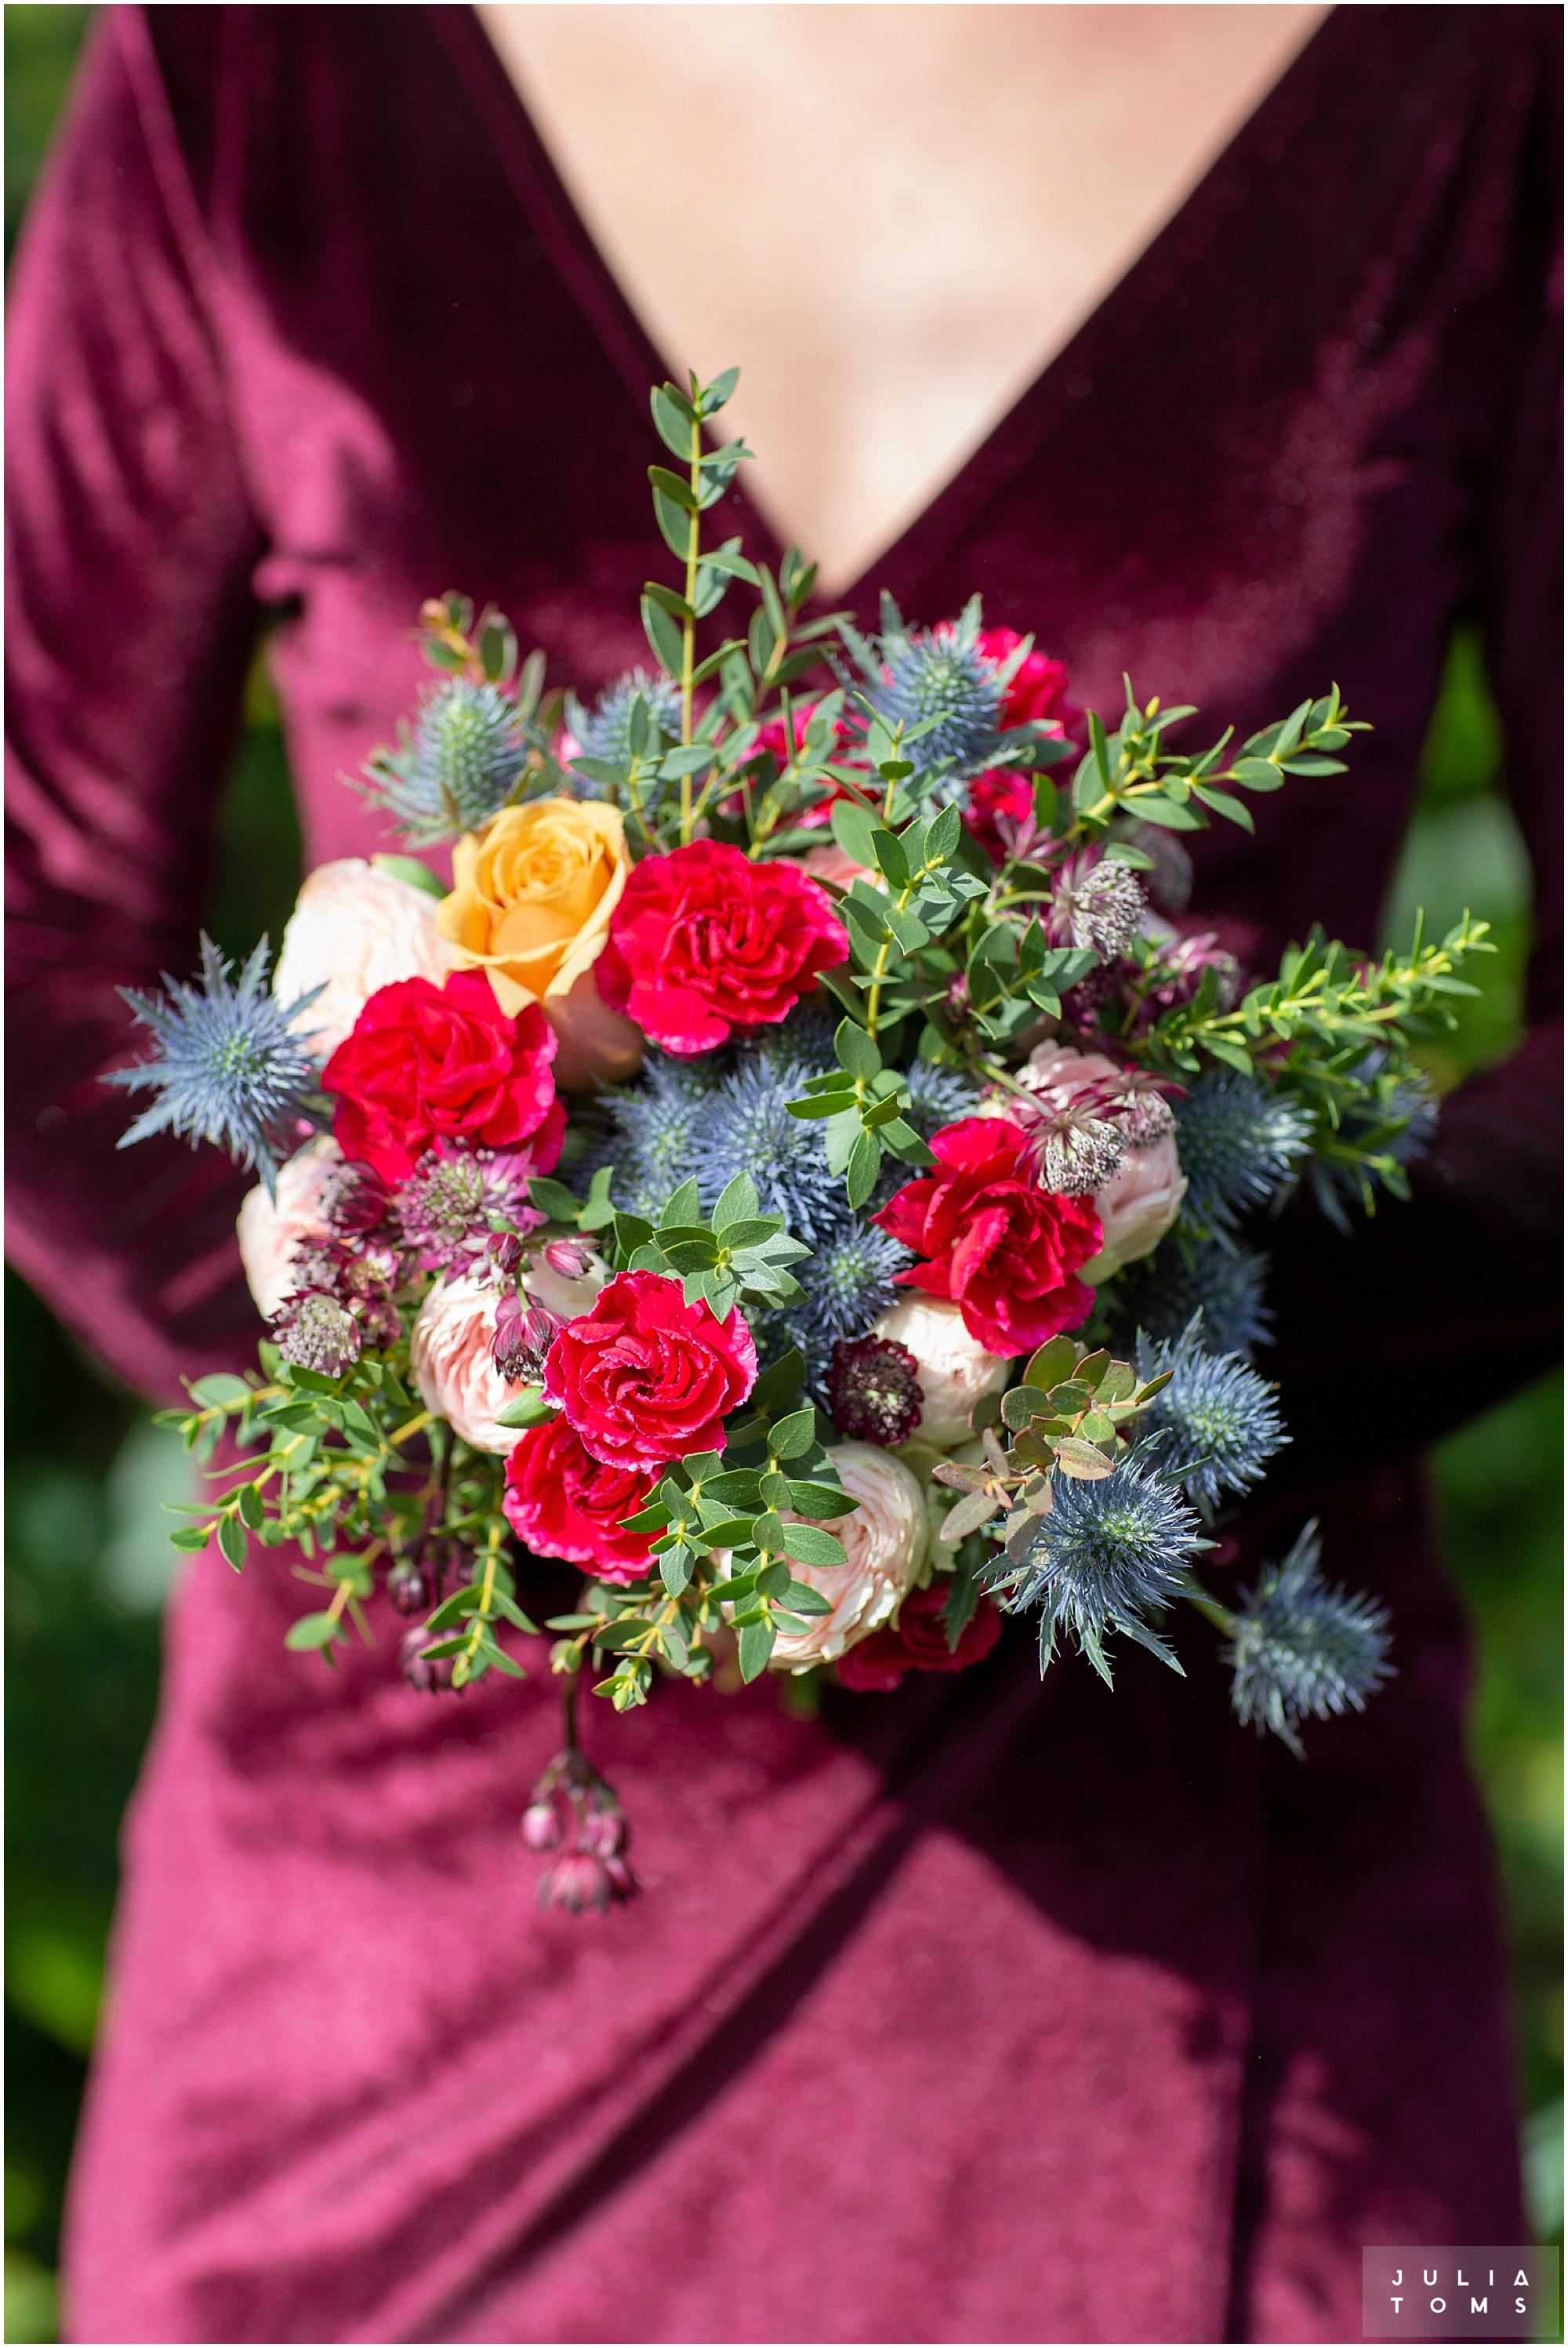 Southend_barn_wedding_photographer_juliatoms_002.jpg